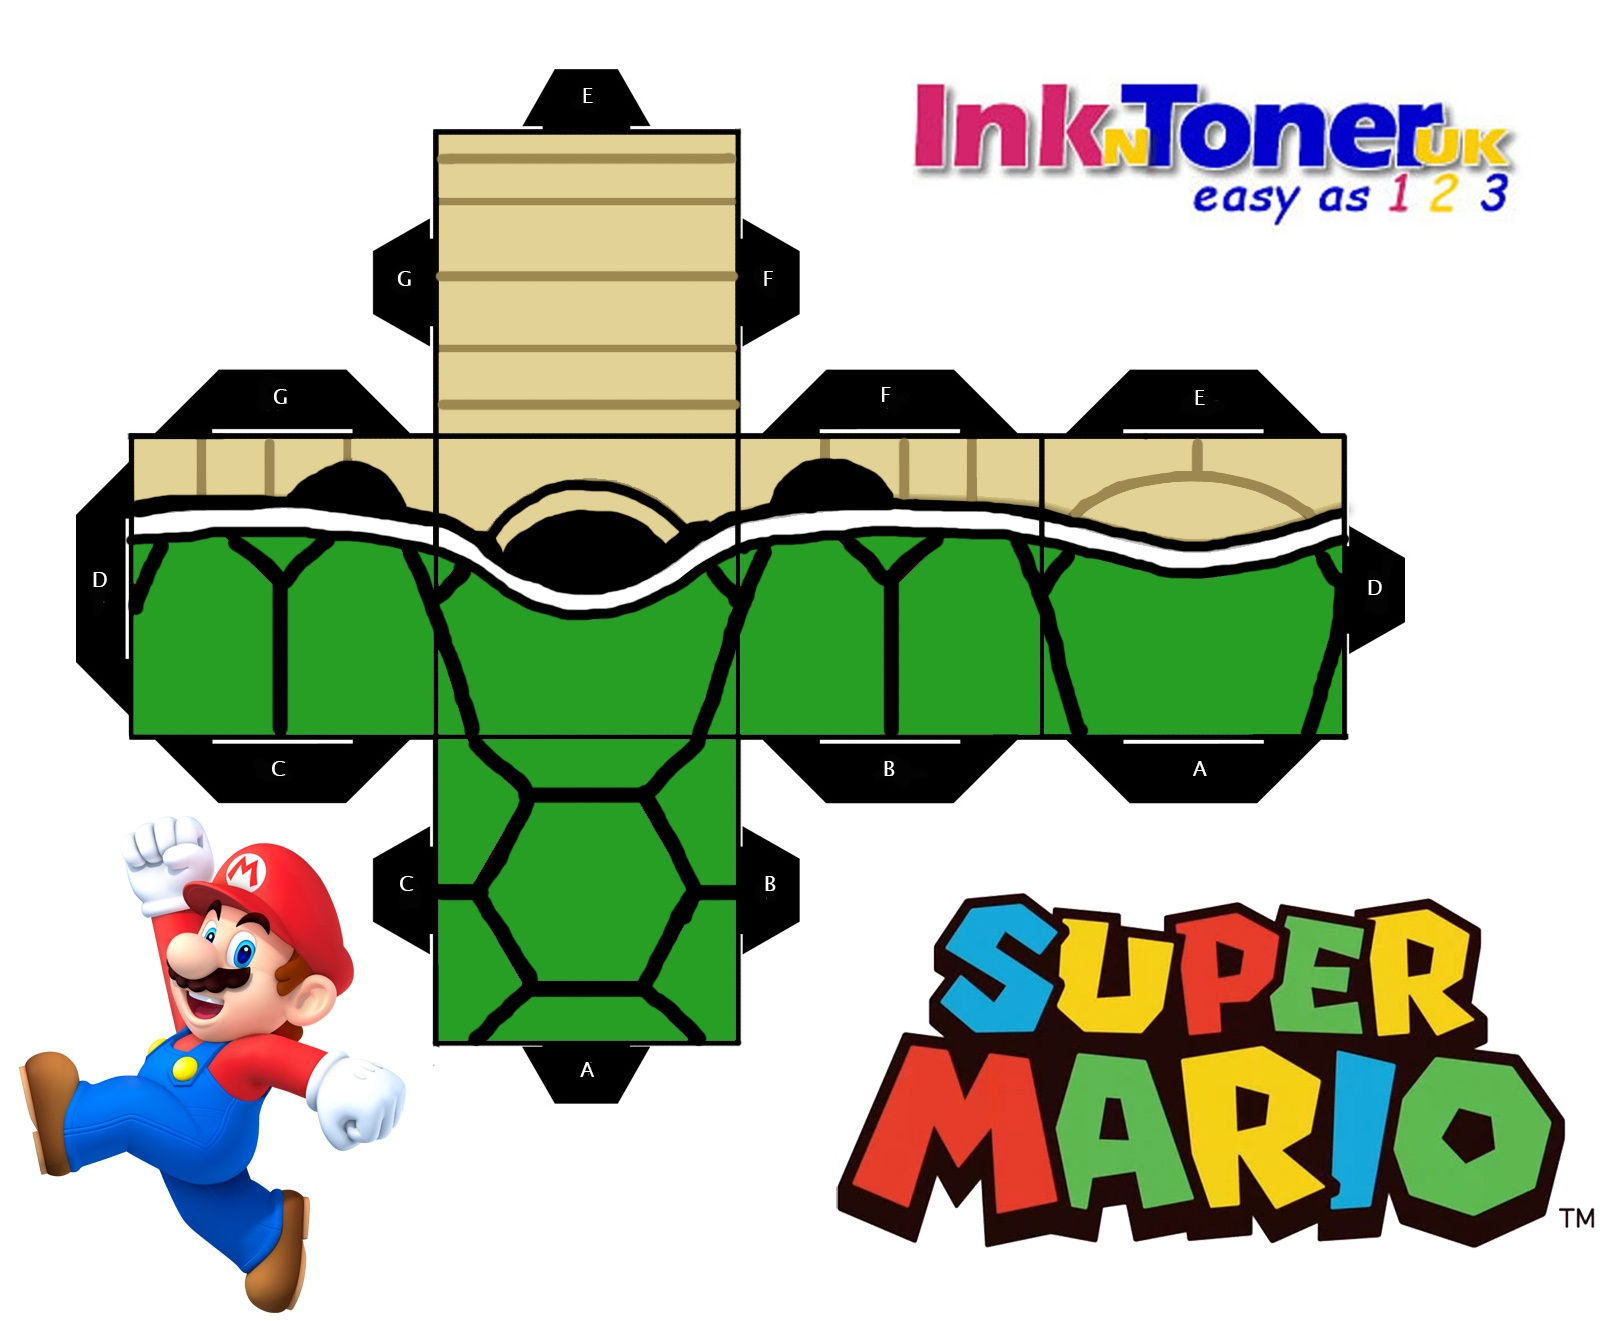 Super Mario Printables (89+ Images In Collection) Page 1 - Free Mario Printables